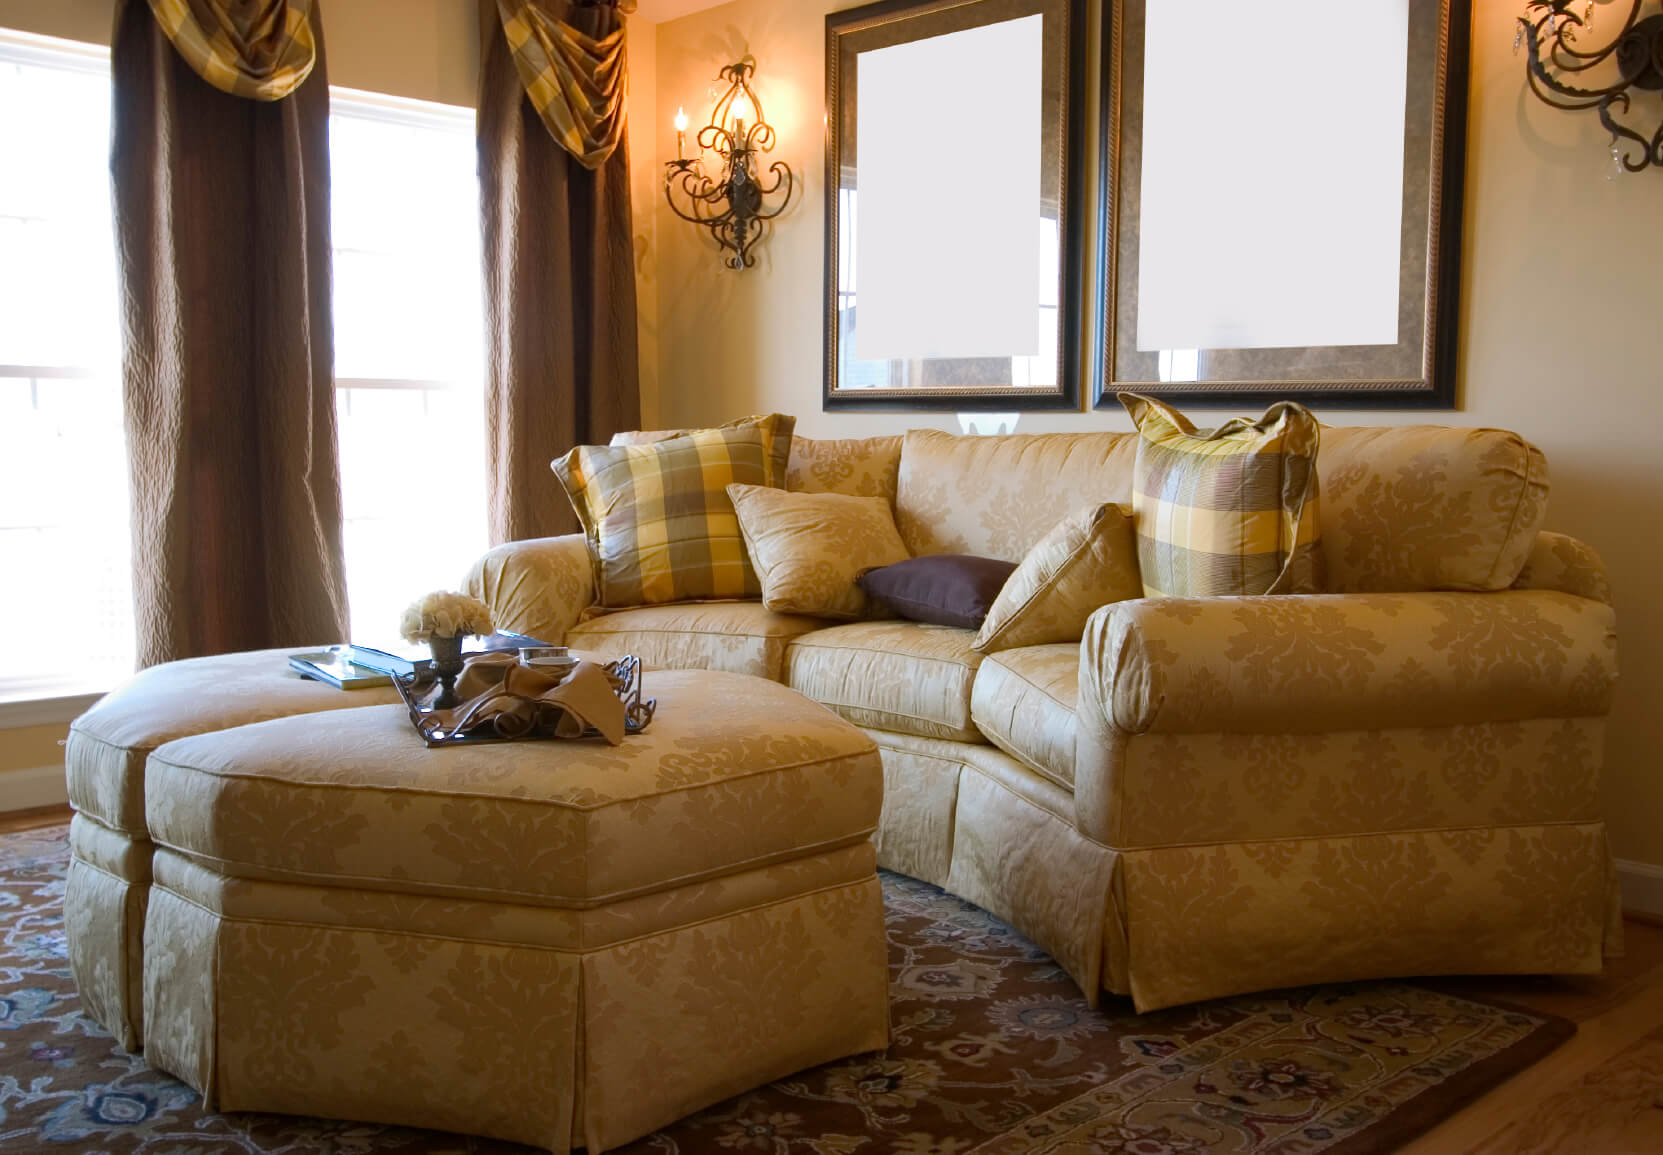 custom-furniture-upholstery-design-atlanta-georgia-11.jpg